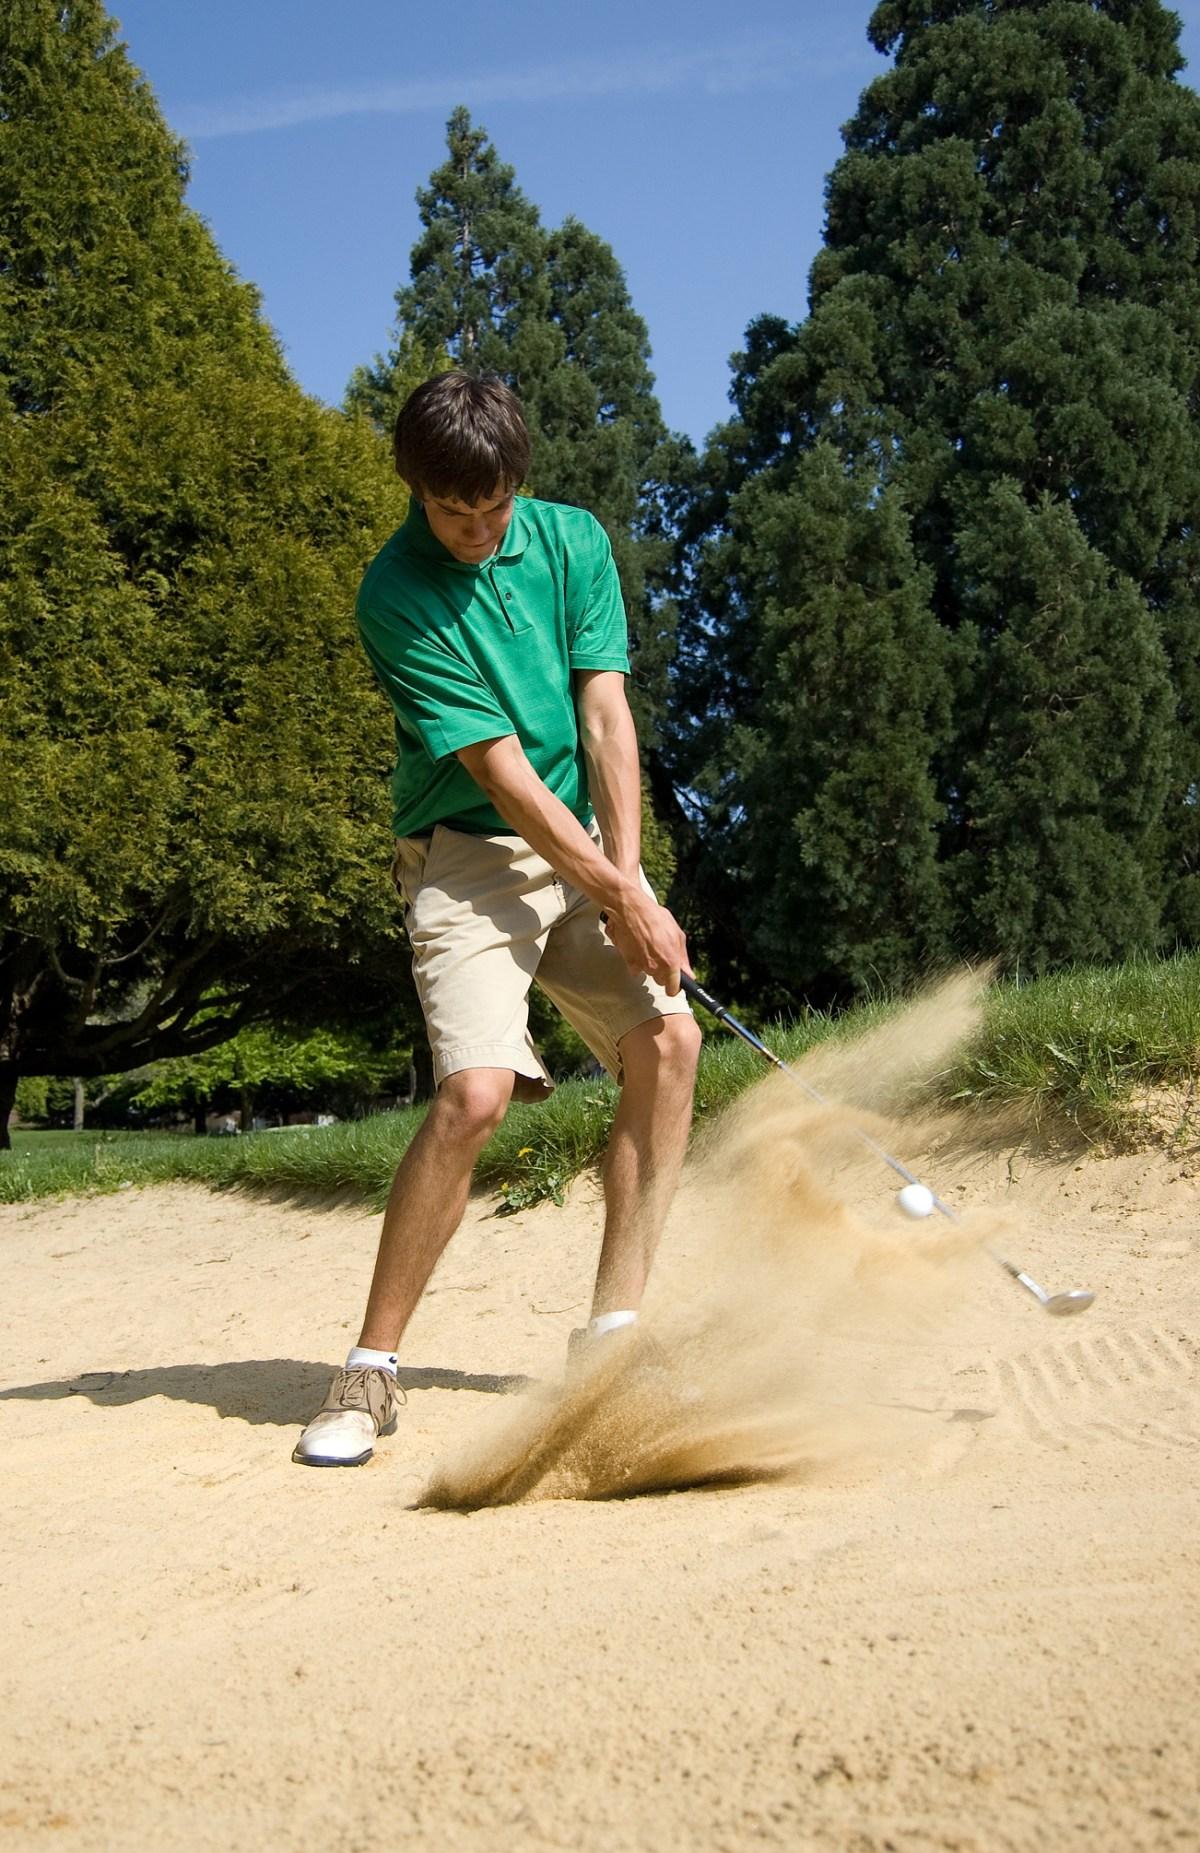 Golf_Bunker_shot_1